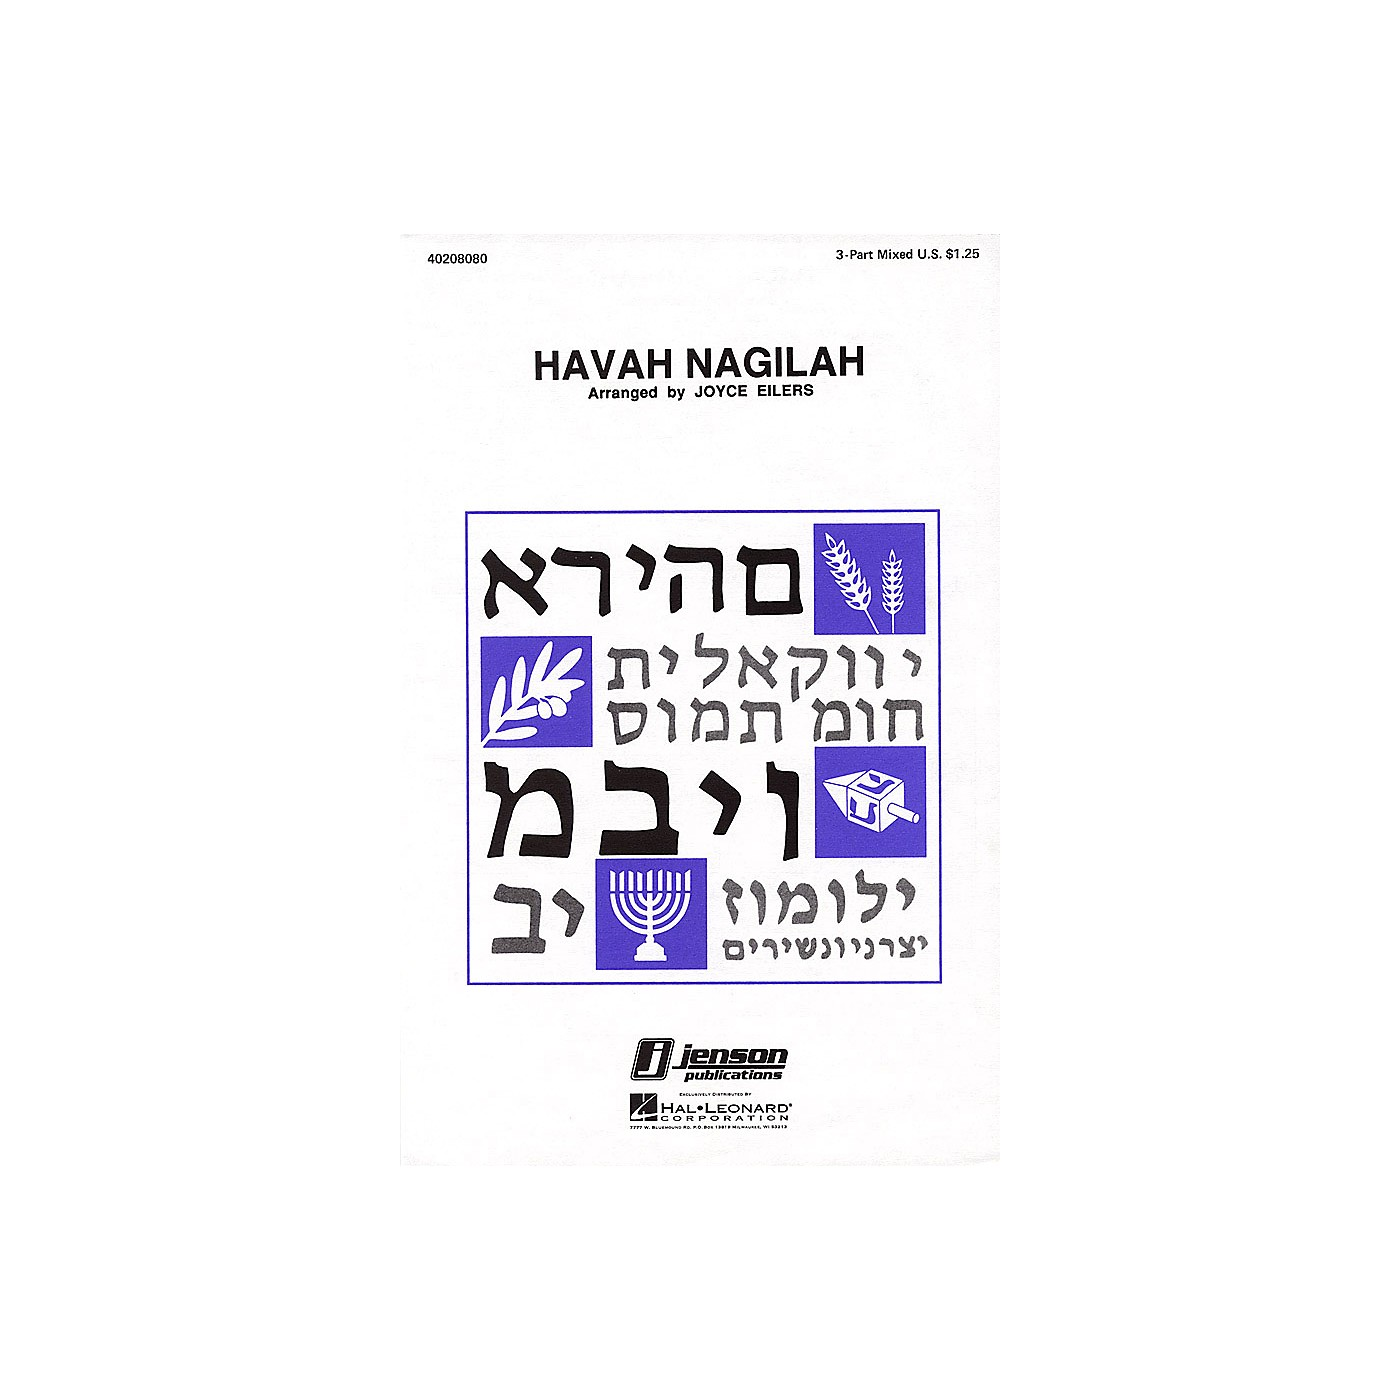 Hal Leonard Havah Nagilah 3-Part Mixed arranged by Joyce Eilers thumbnail